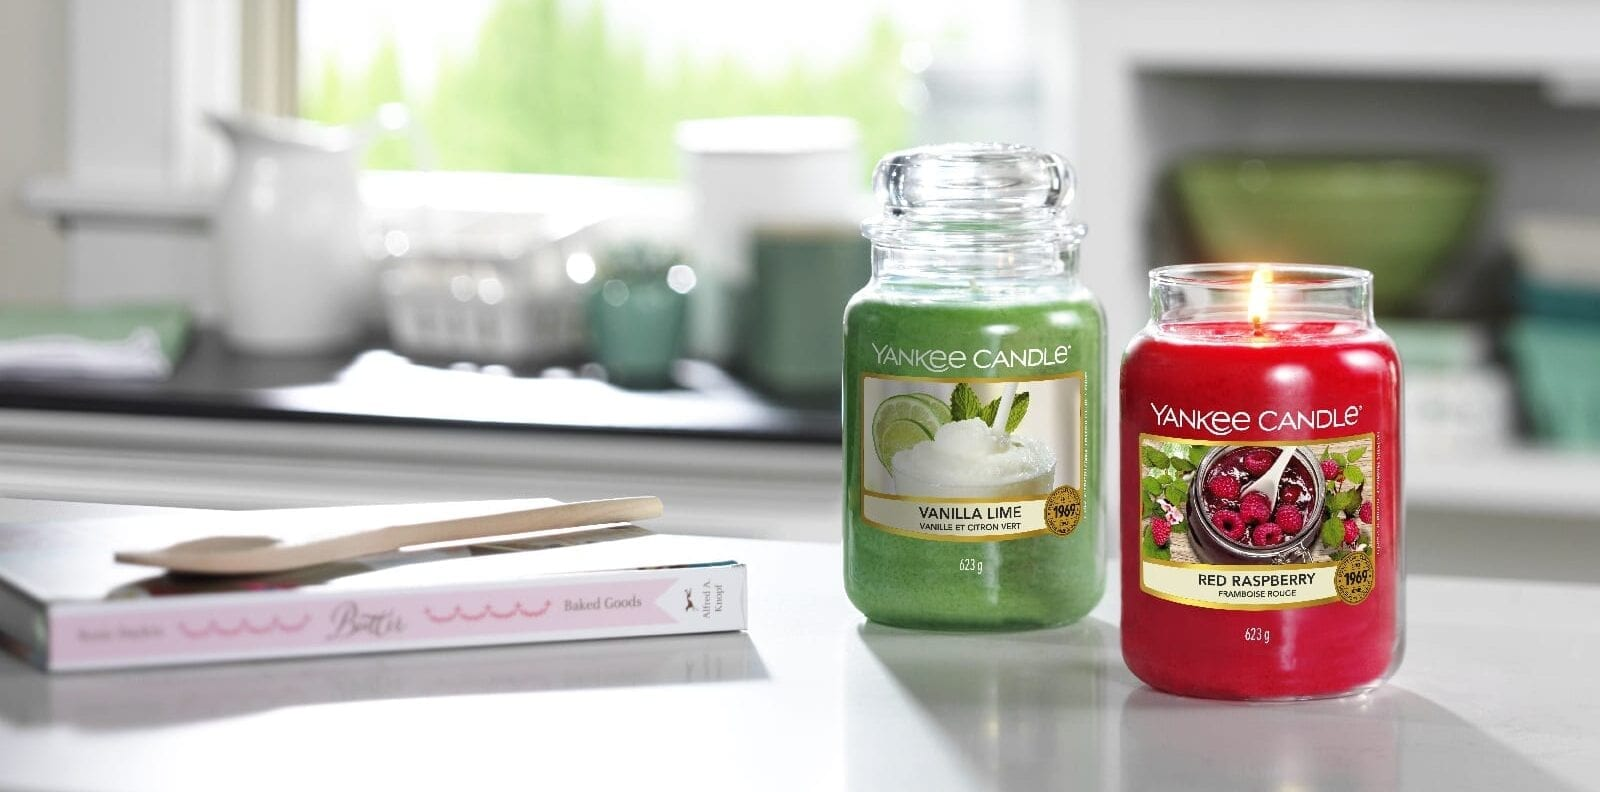 Vanilla Lime_Red Raspberry Large Jar brand image